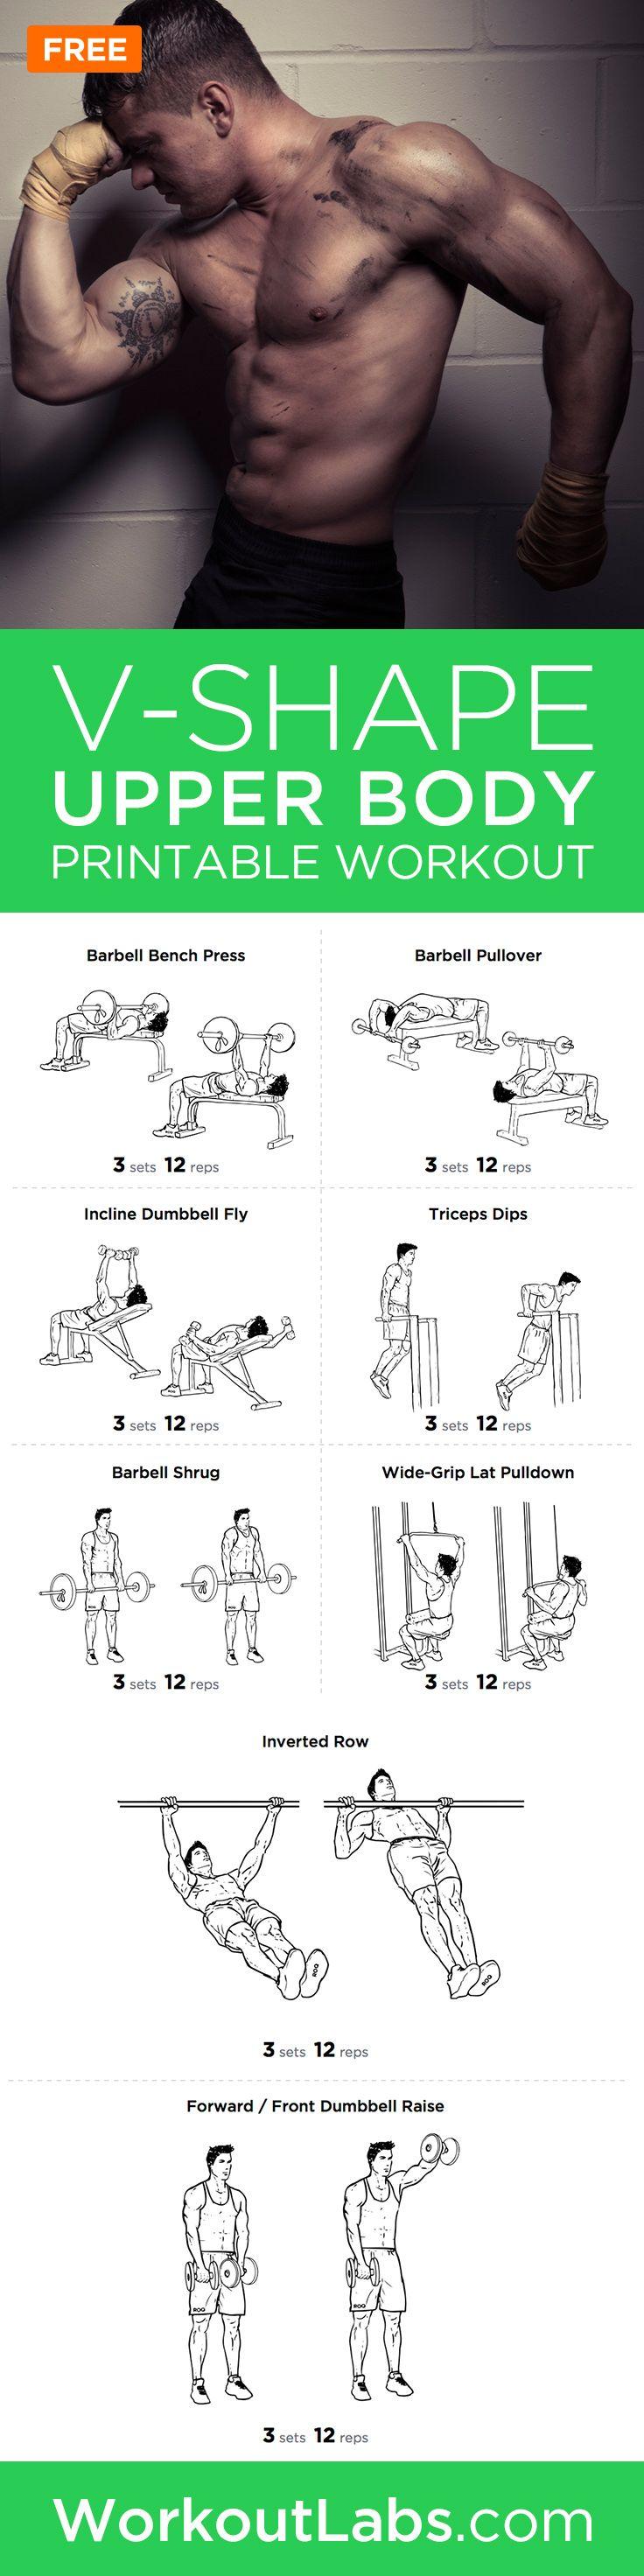 V-Shape Upper Body Printable Workout Plan for Chest